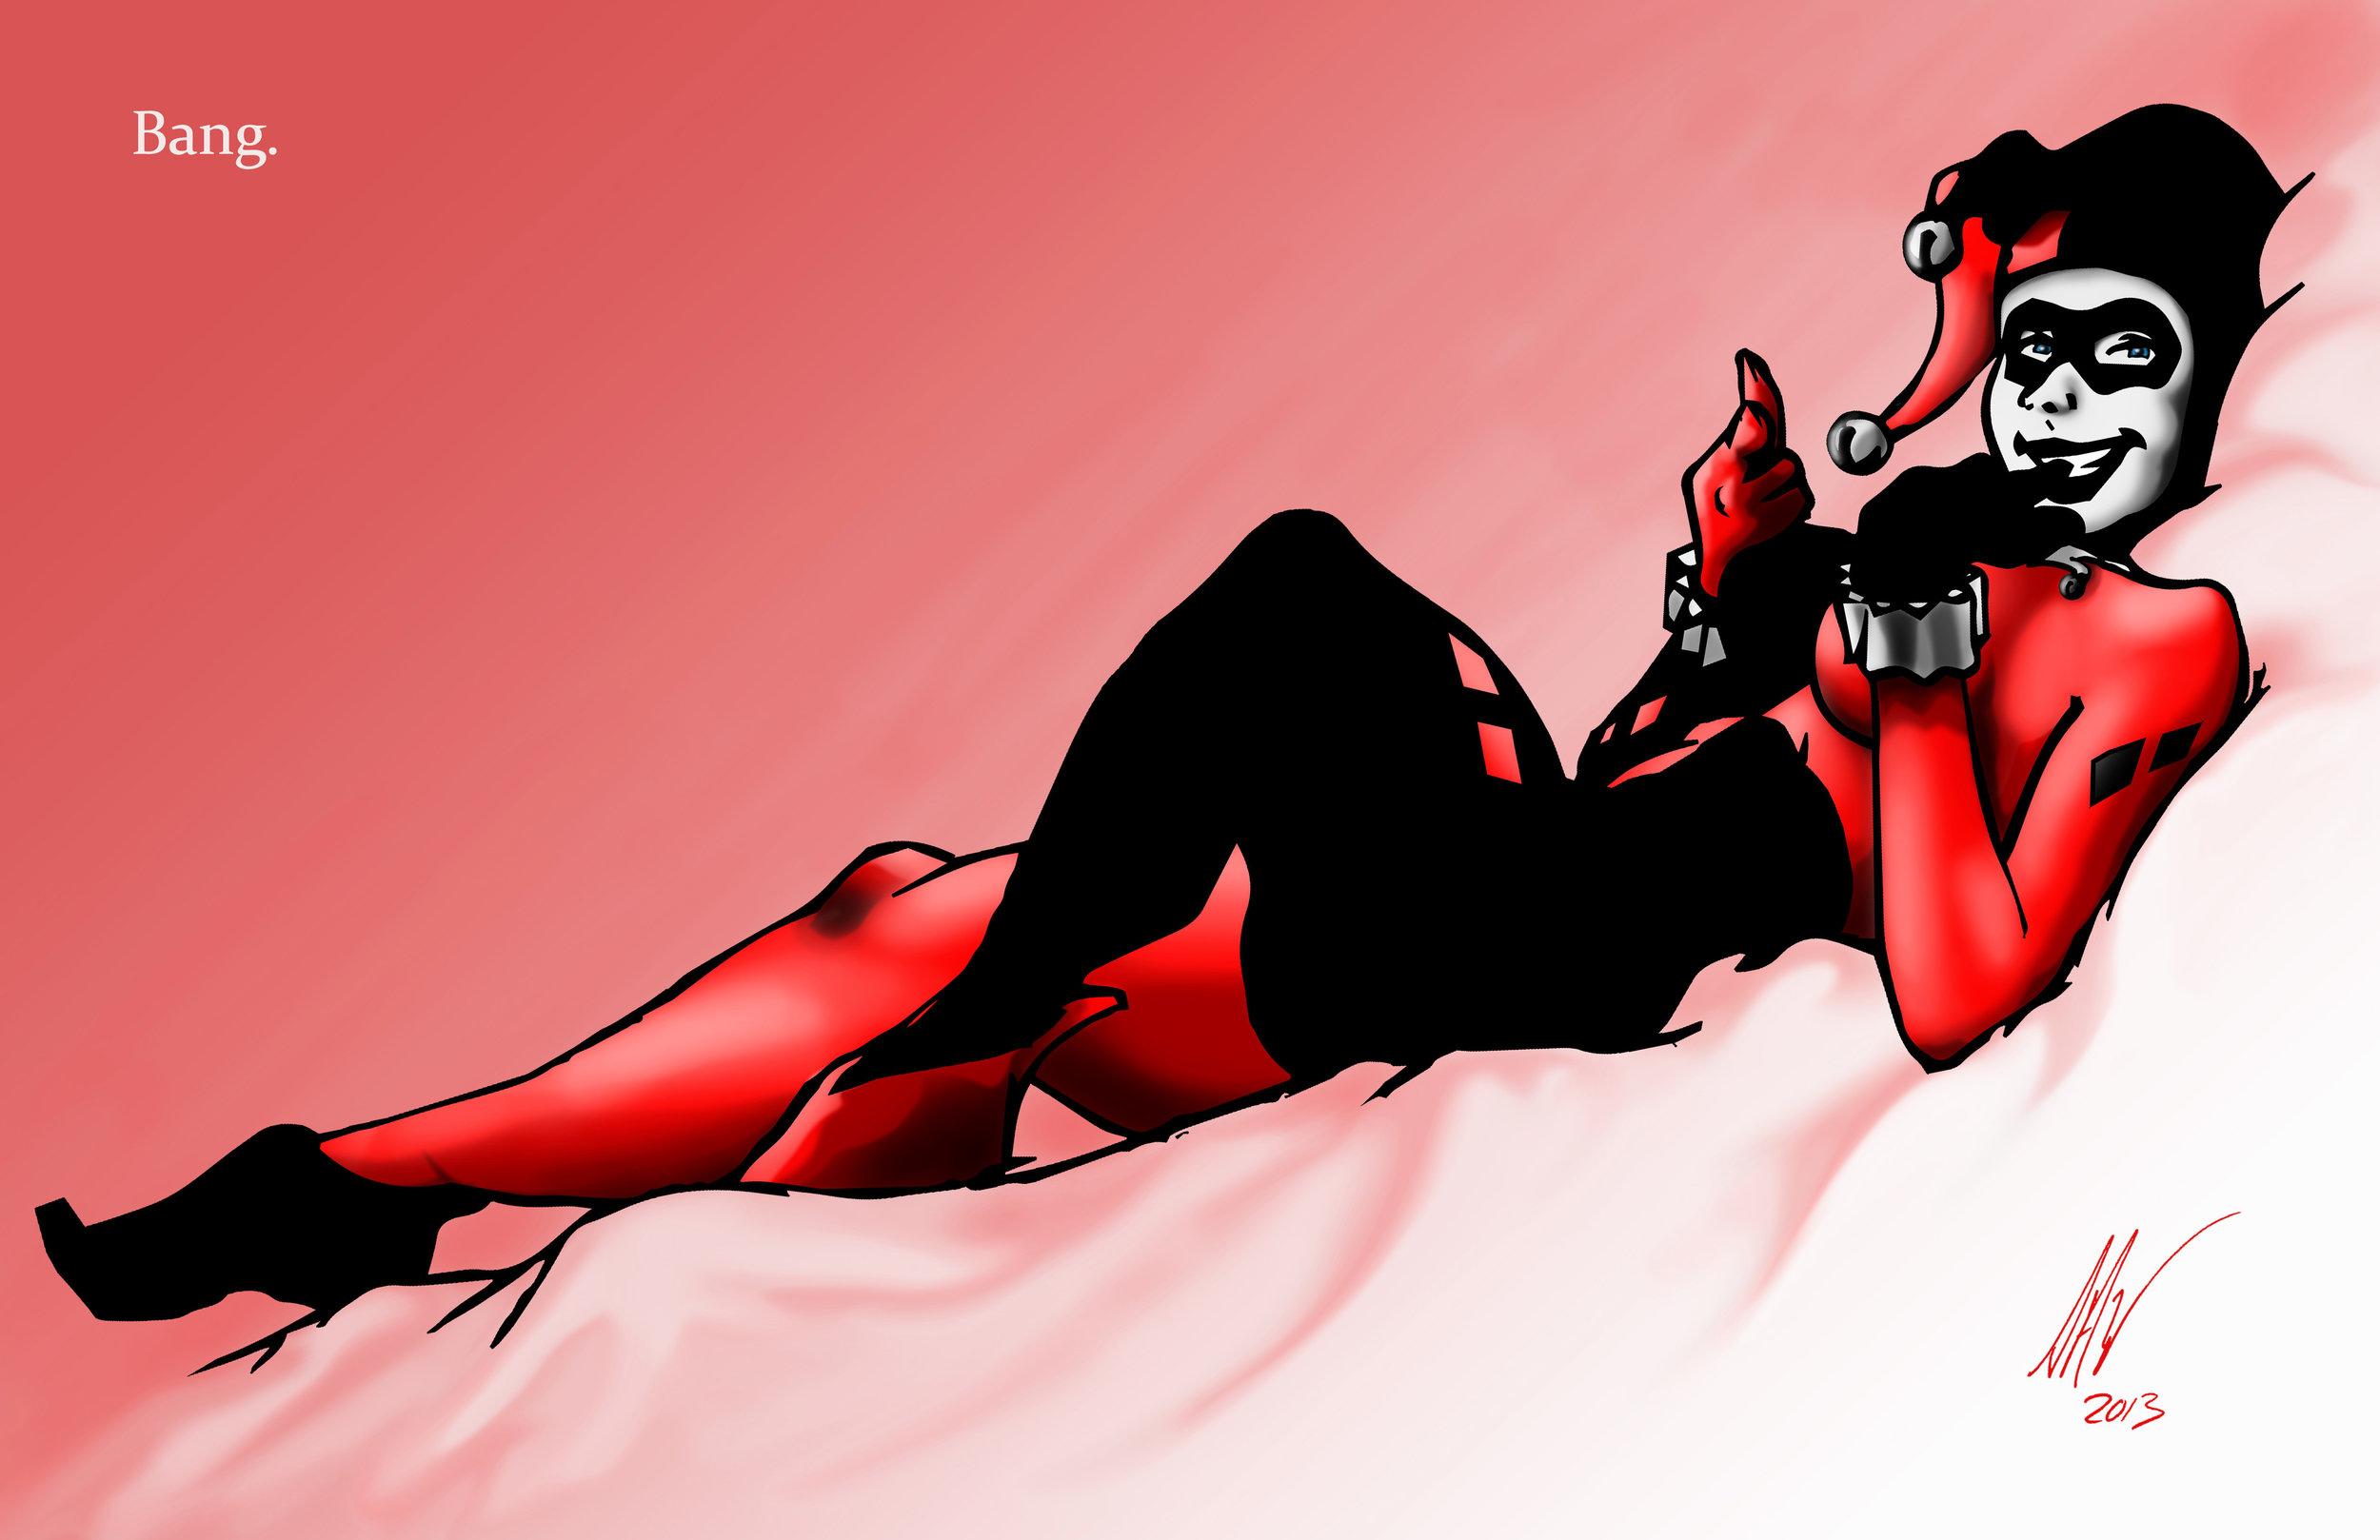 Harley Quinn-Bang 11x17.jpg